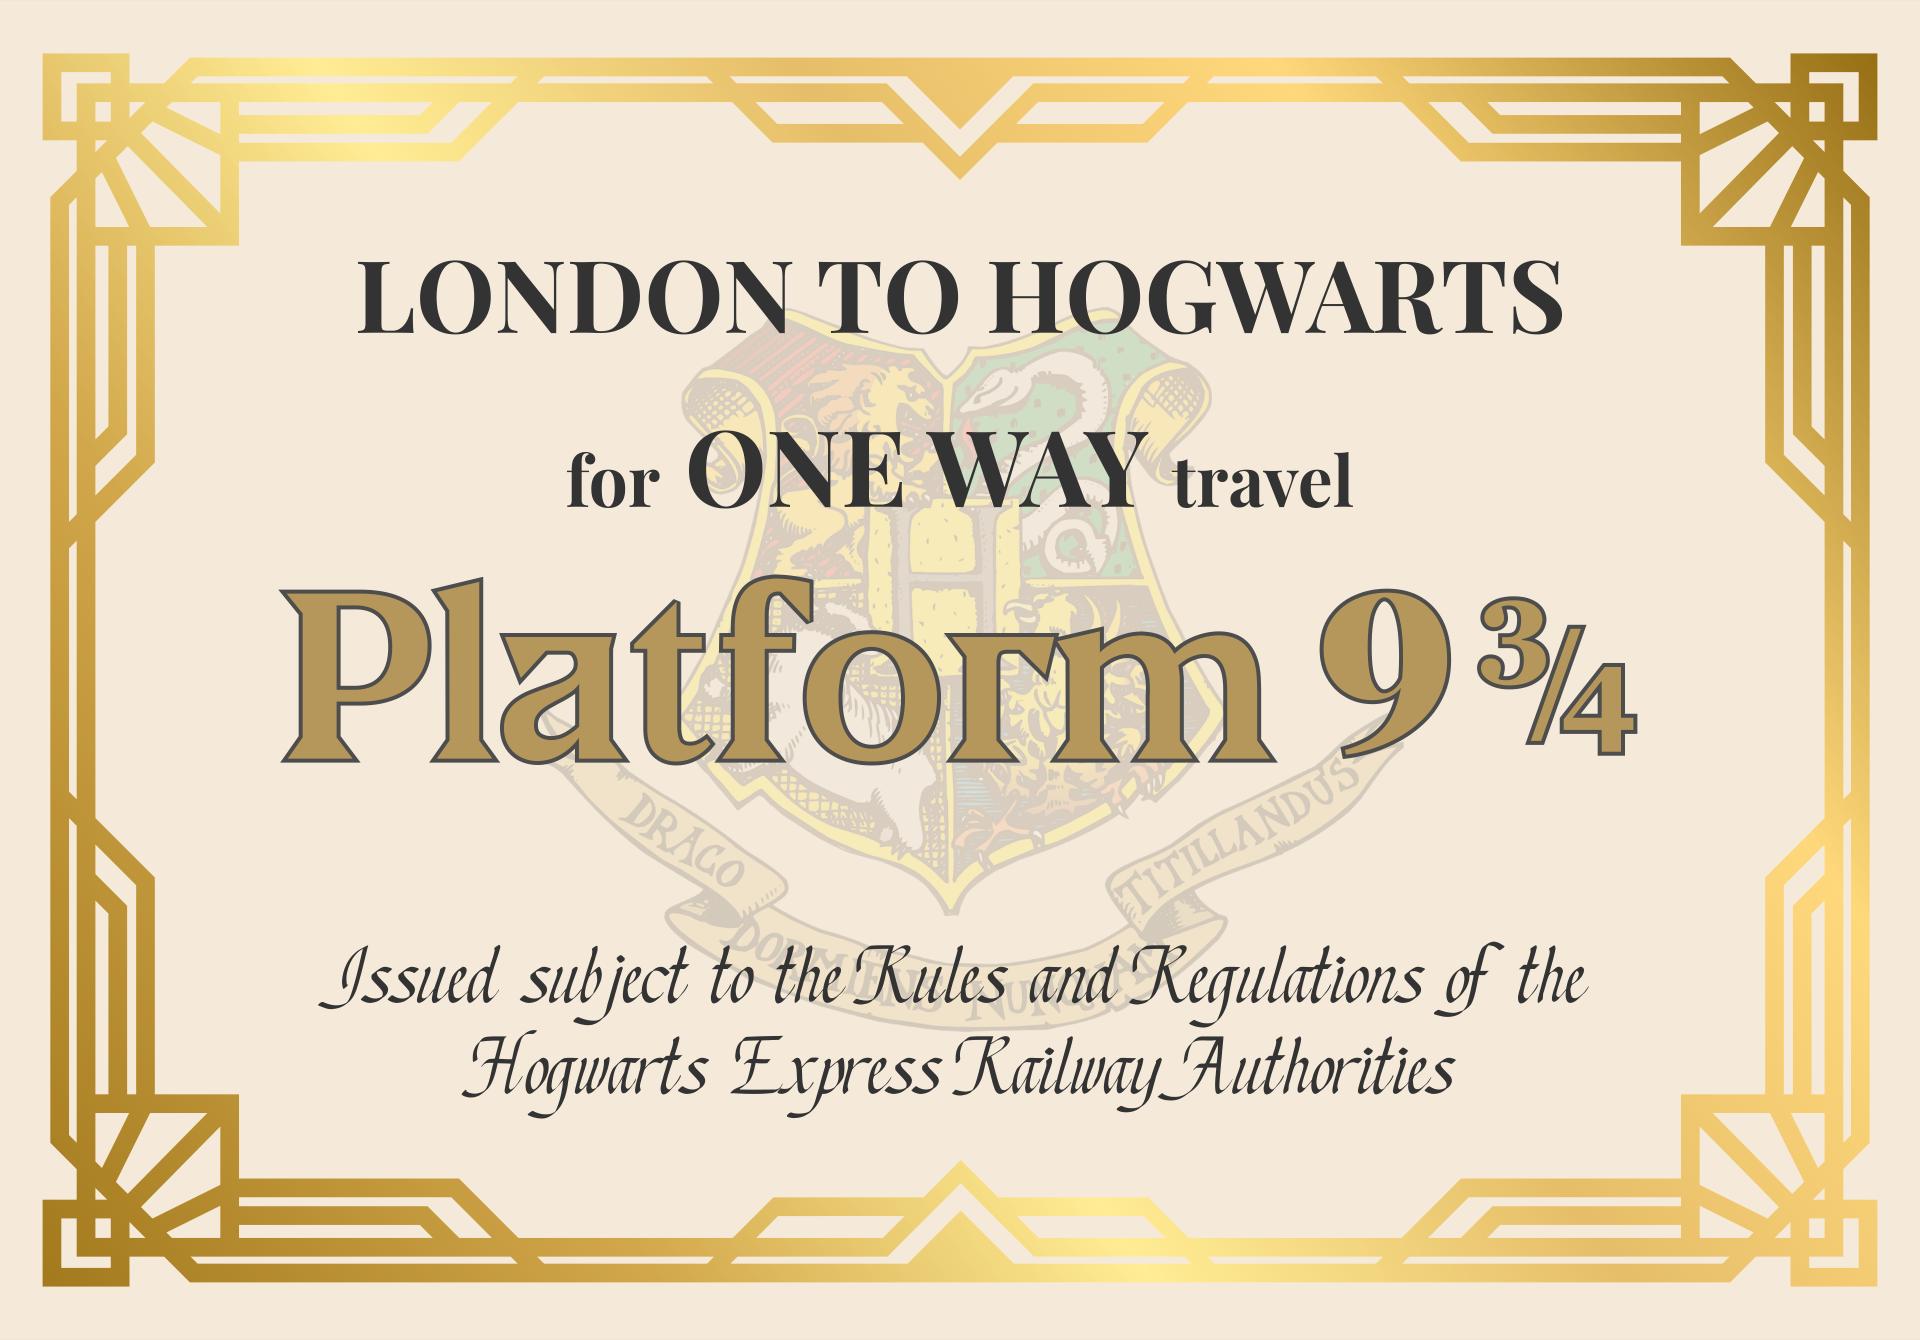 Harry Potter Hogwarts Train Ticket